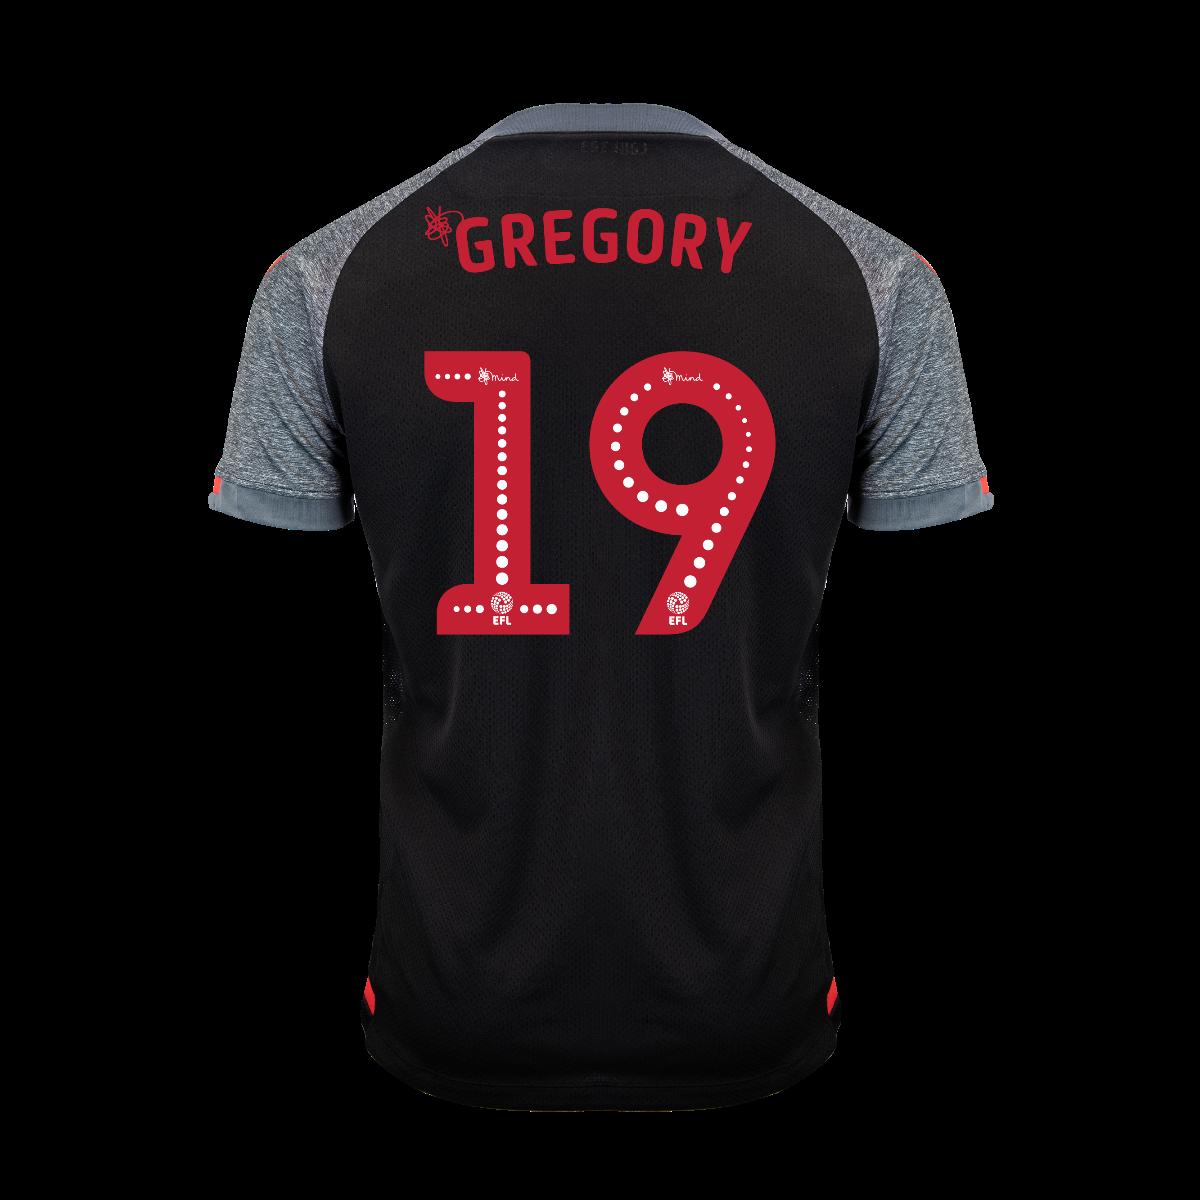 2019/20 Ladies Away Shirt - Gregory